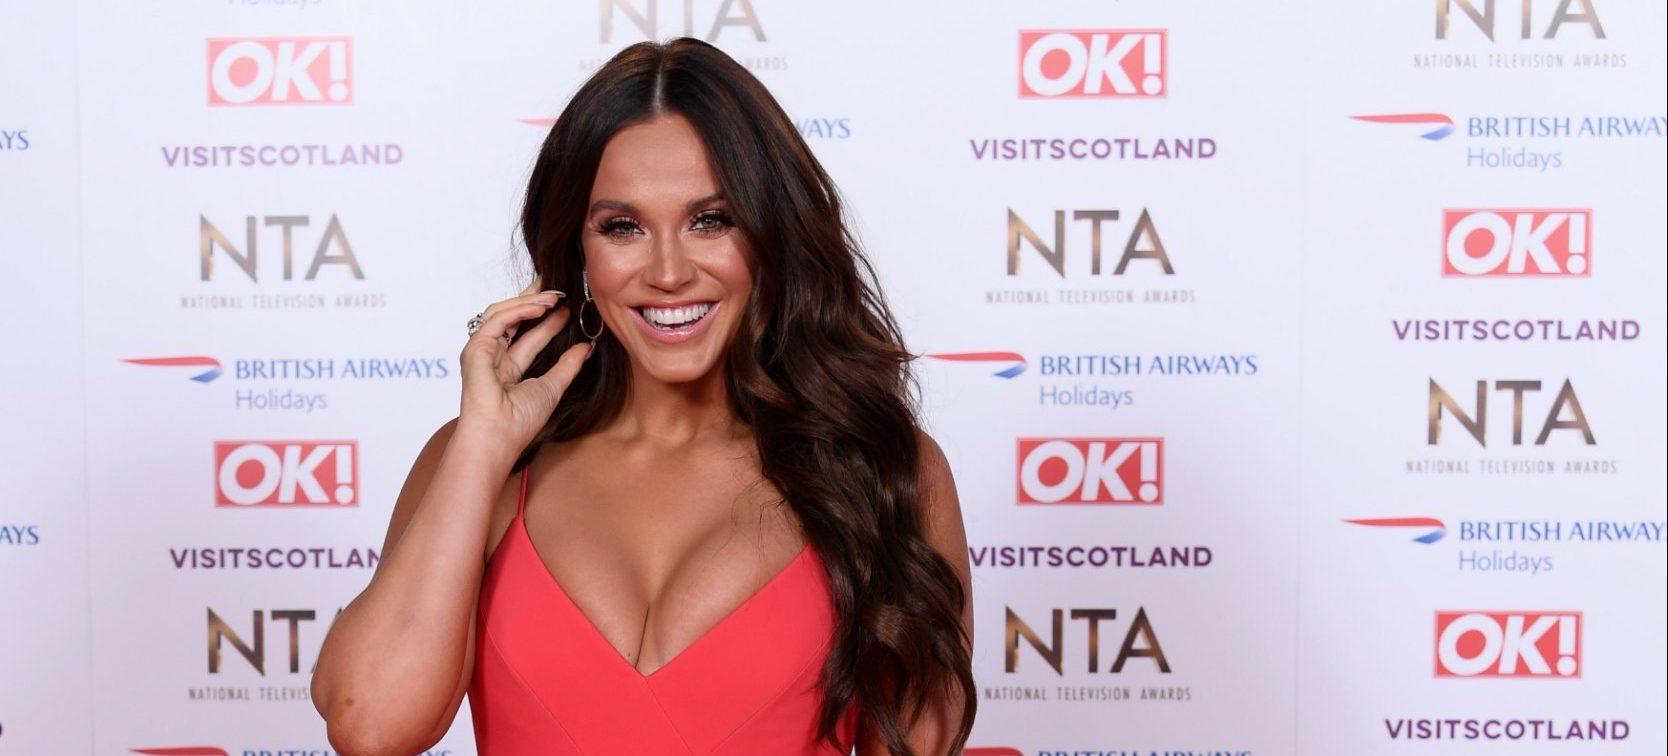 Mandatory Credit: Photo by David Fisher/REX/Shutterstock (10069666fs) Vicky Pattison 23rd National Television Awards, Arrivals, O2, London, UK - 22 Jan 2019